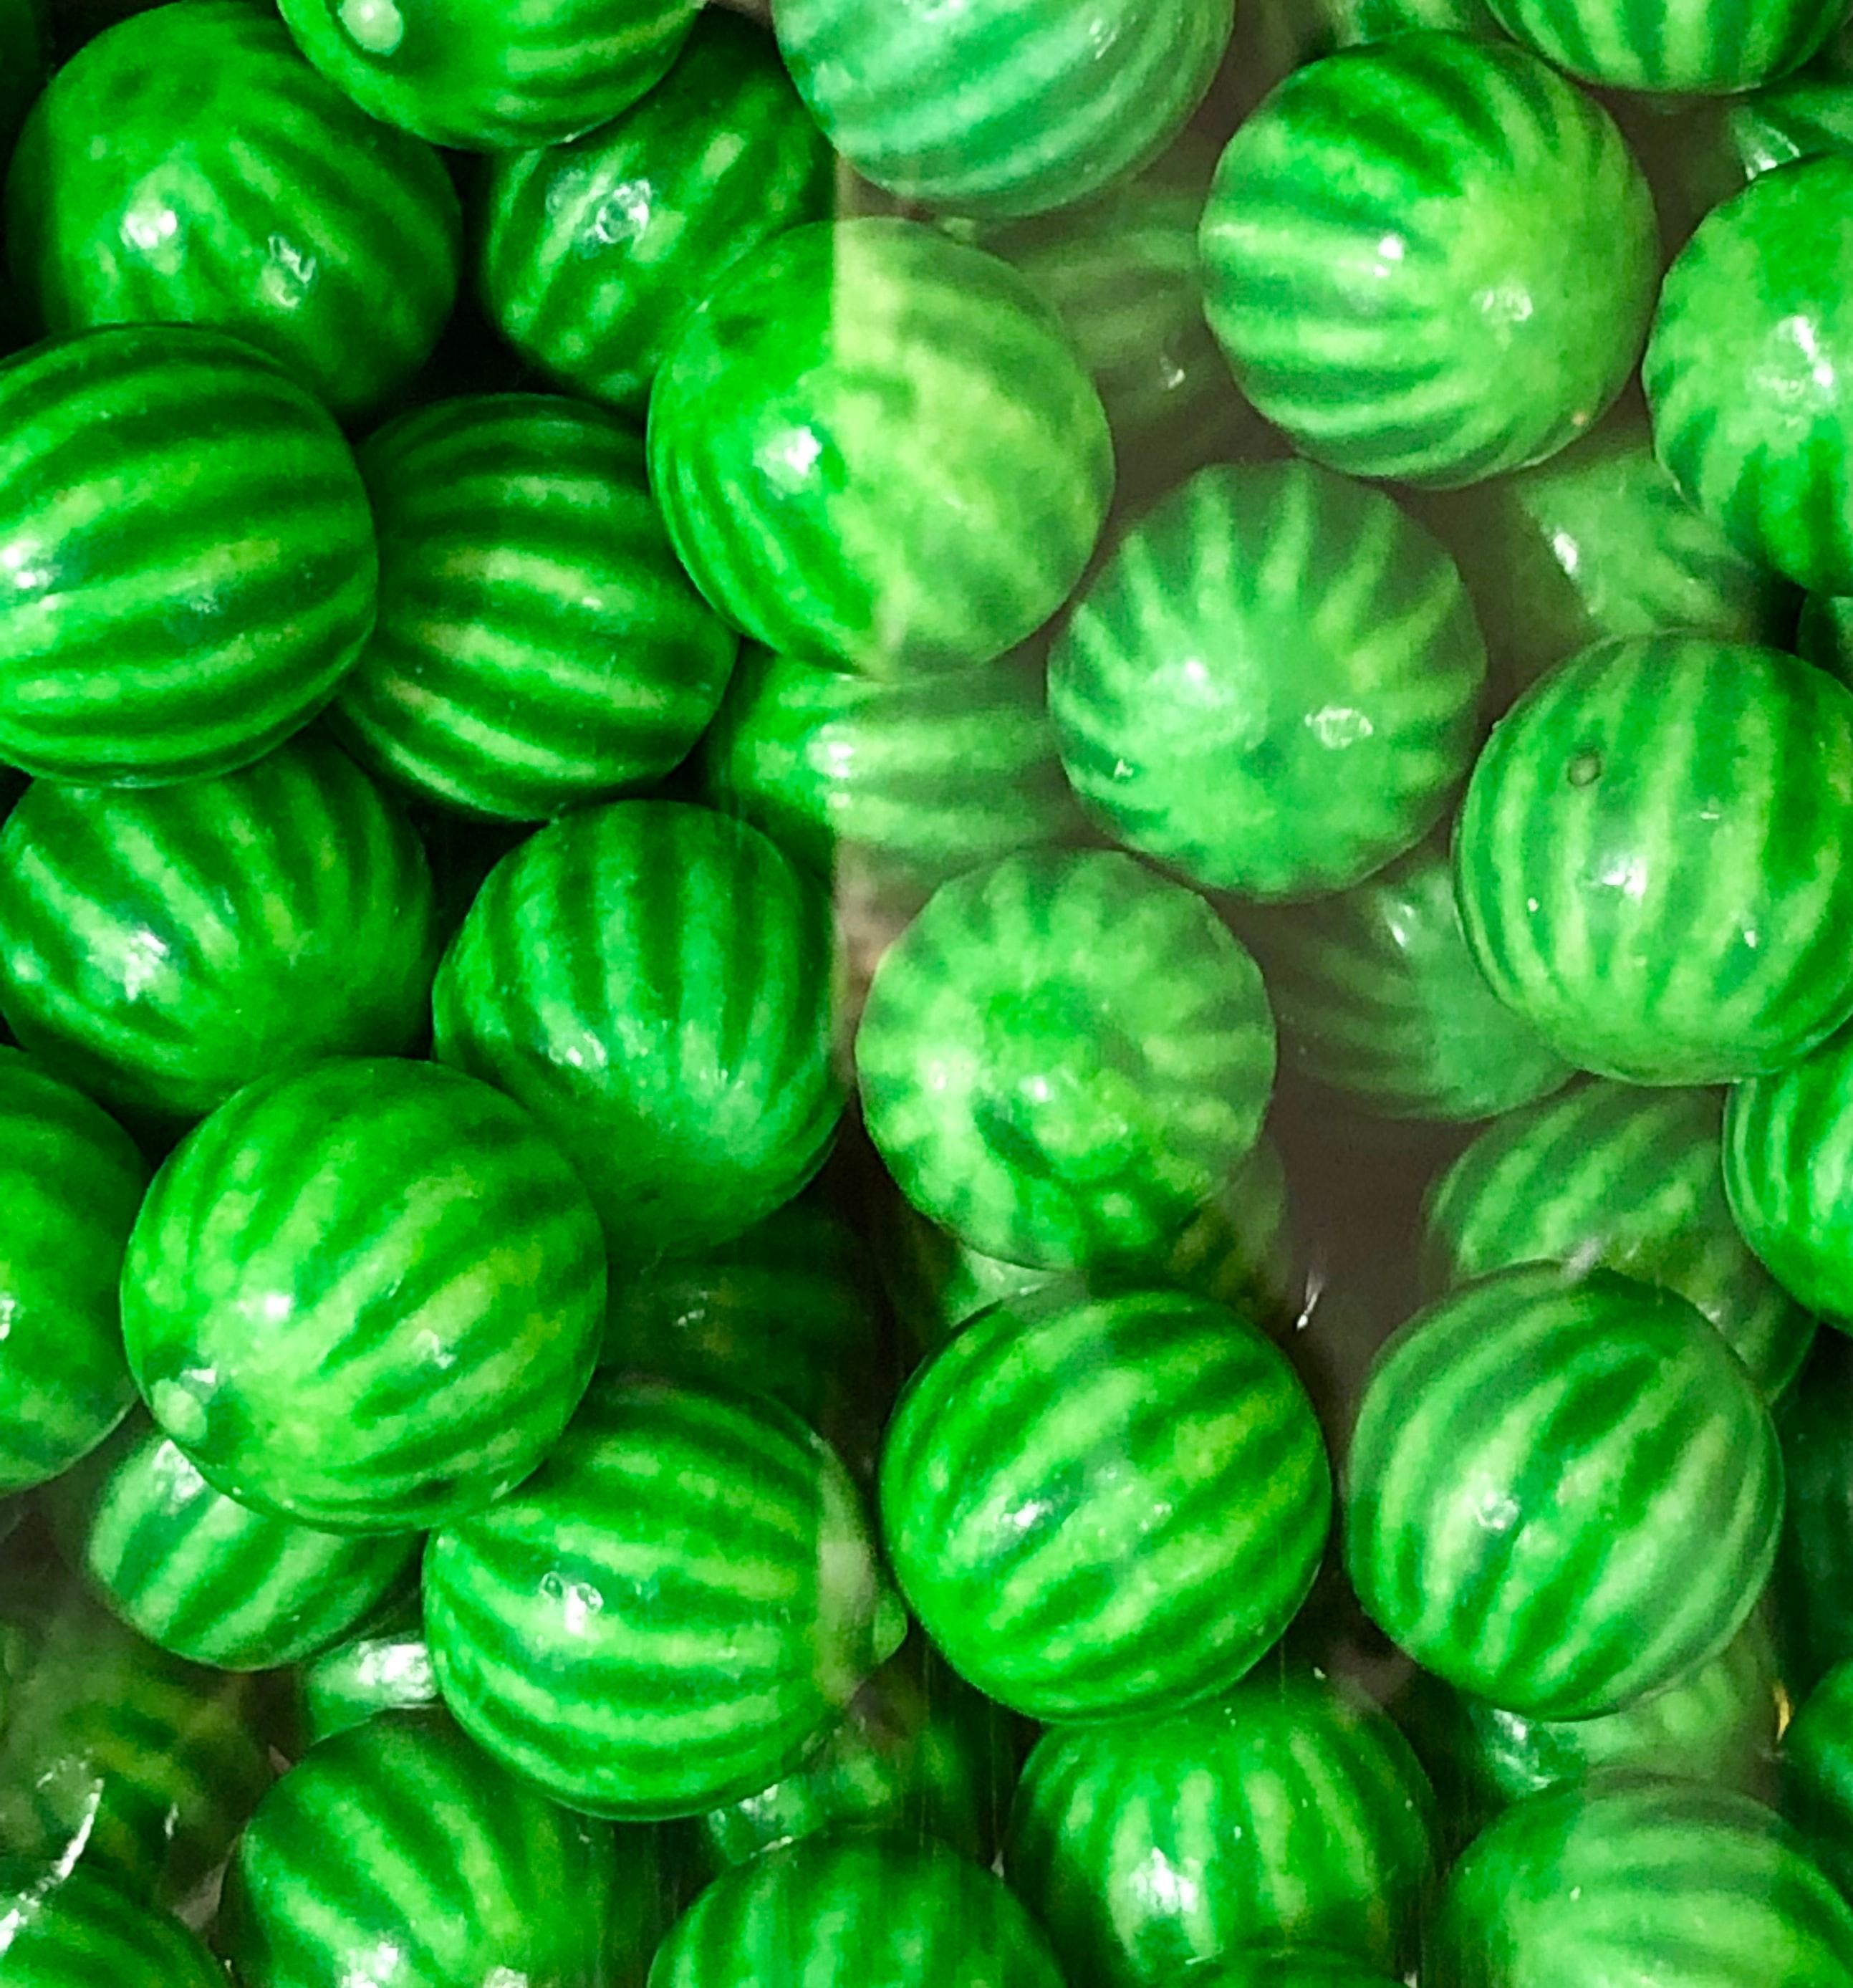 Melon/june-gathercole-5XZQFsJMXQY-unsplash.jpg